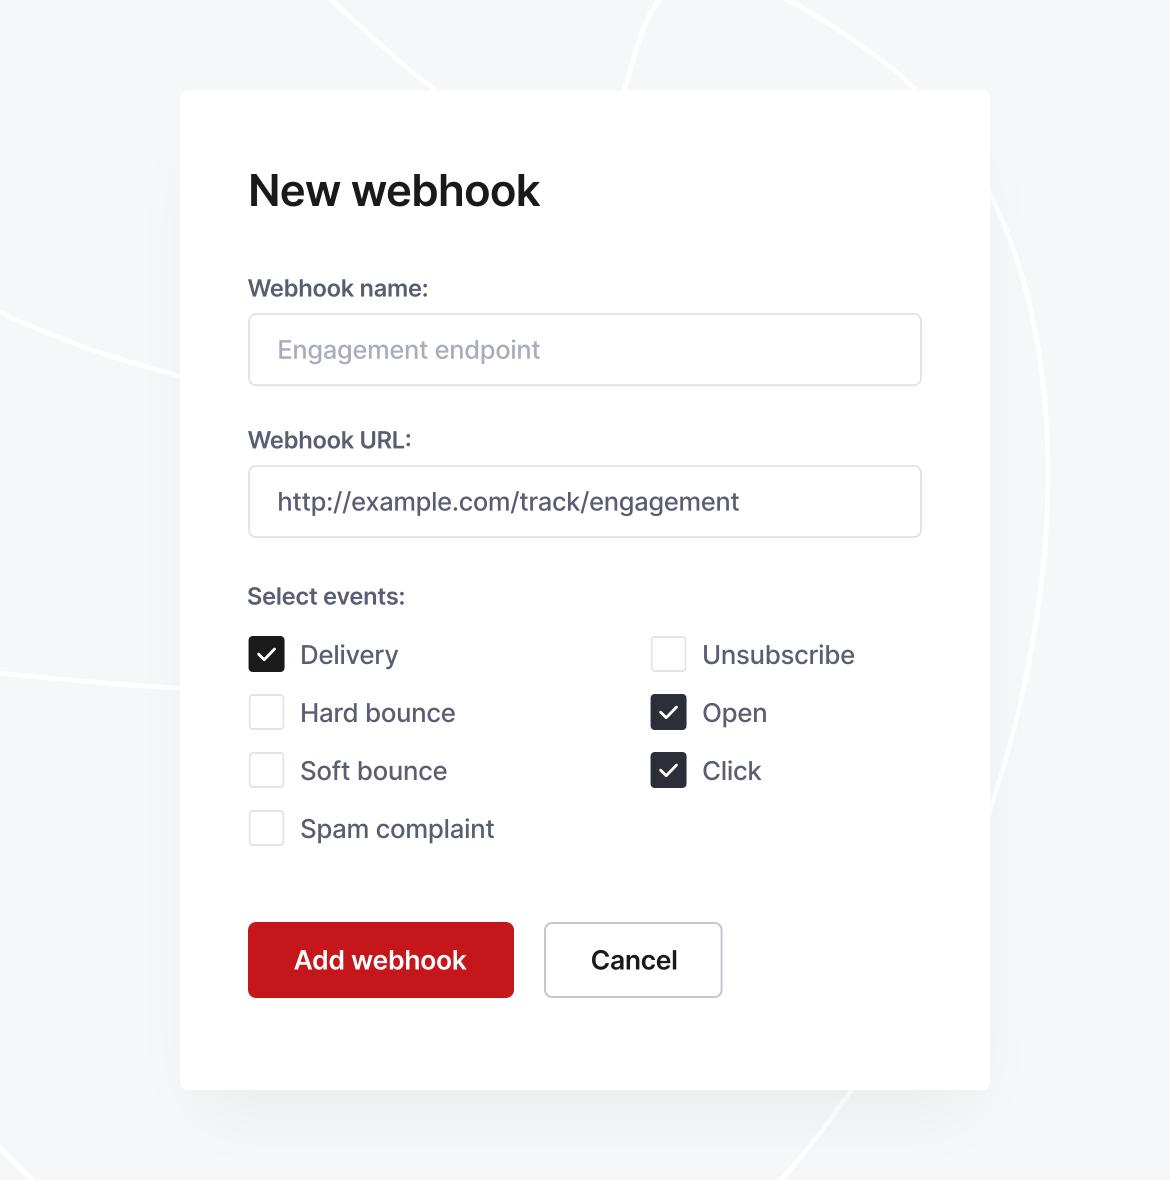 A screenshot of a webhook configuration, taken from Coresender control panel.